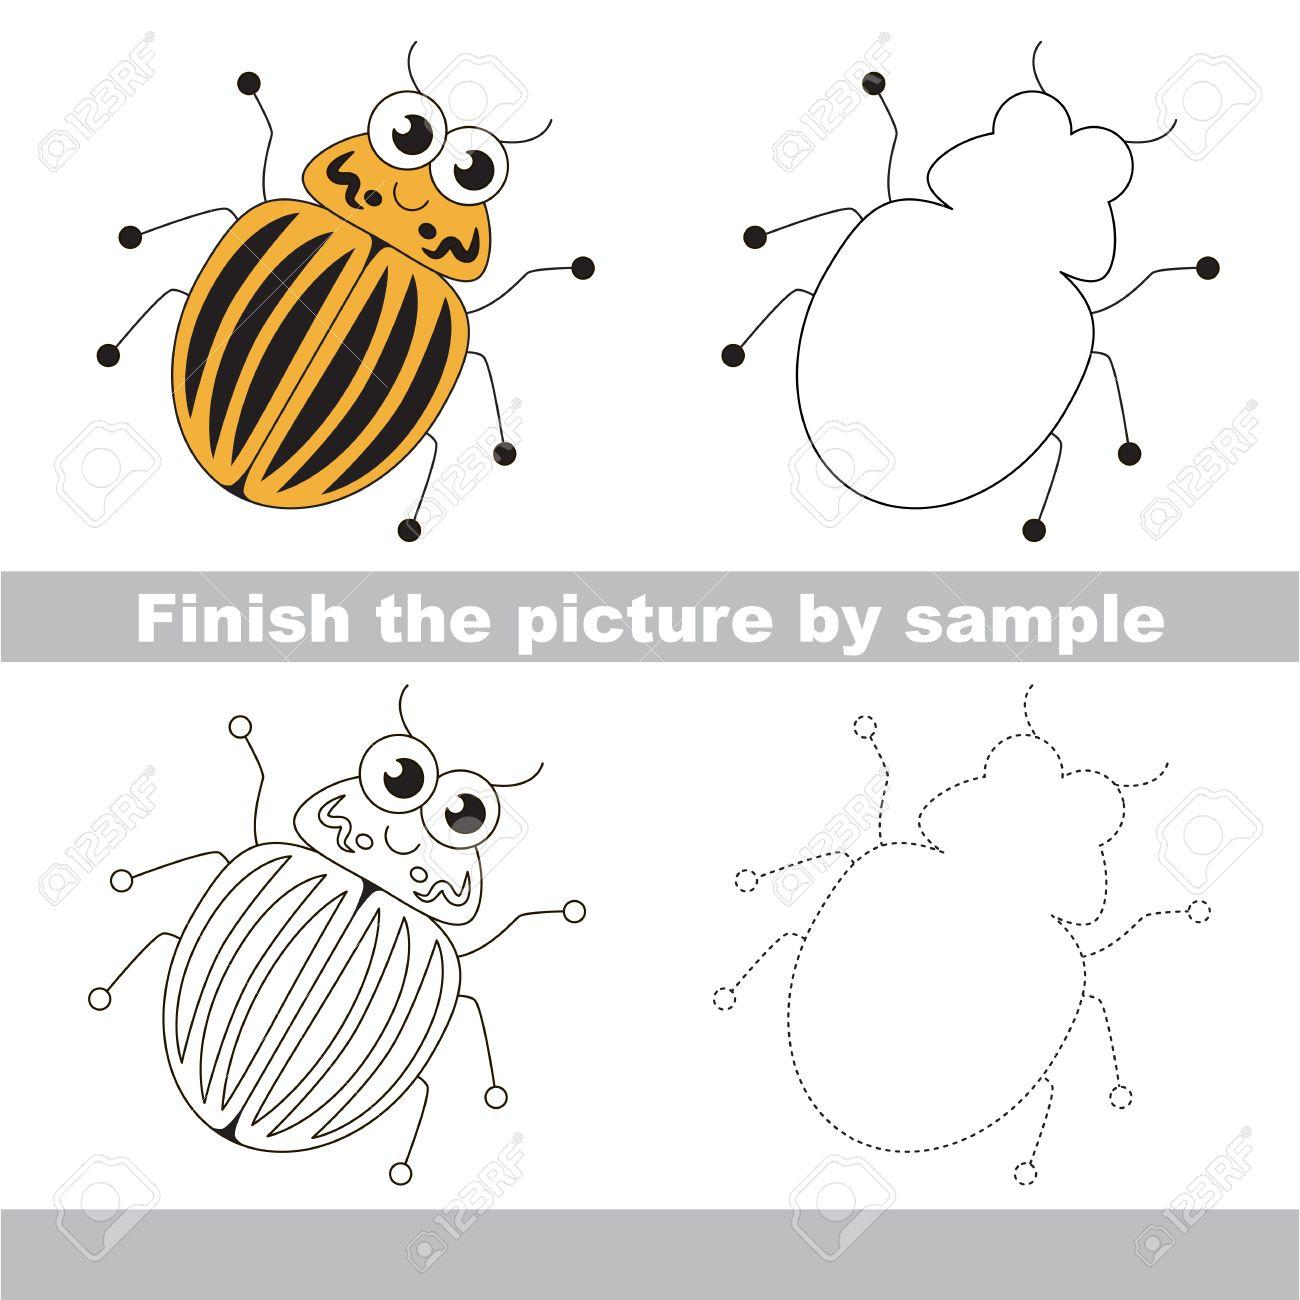 Charmant Invertebrate Arbeitsblatt Bilder - Super Lehrer ...